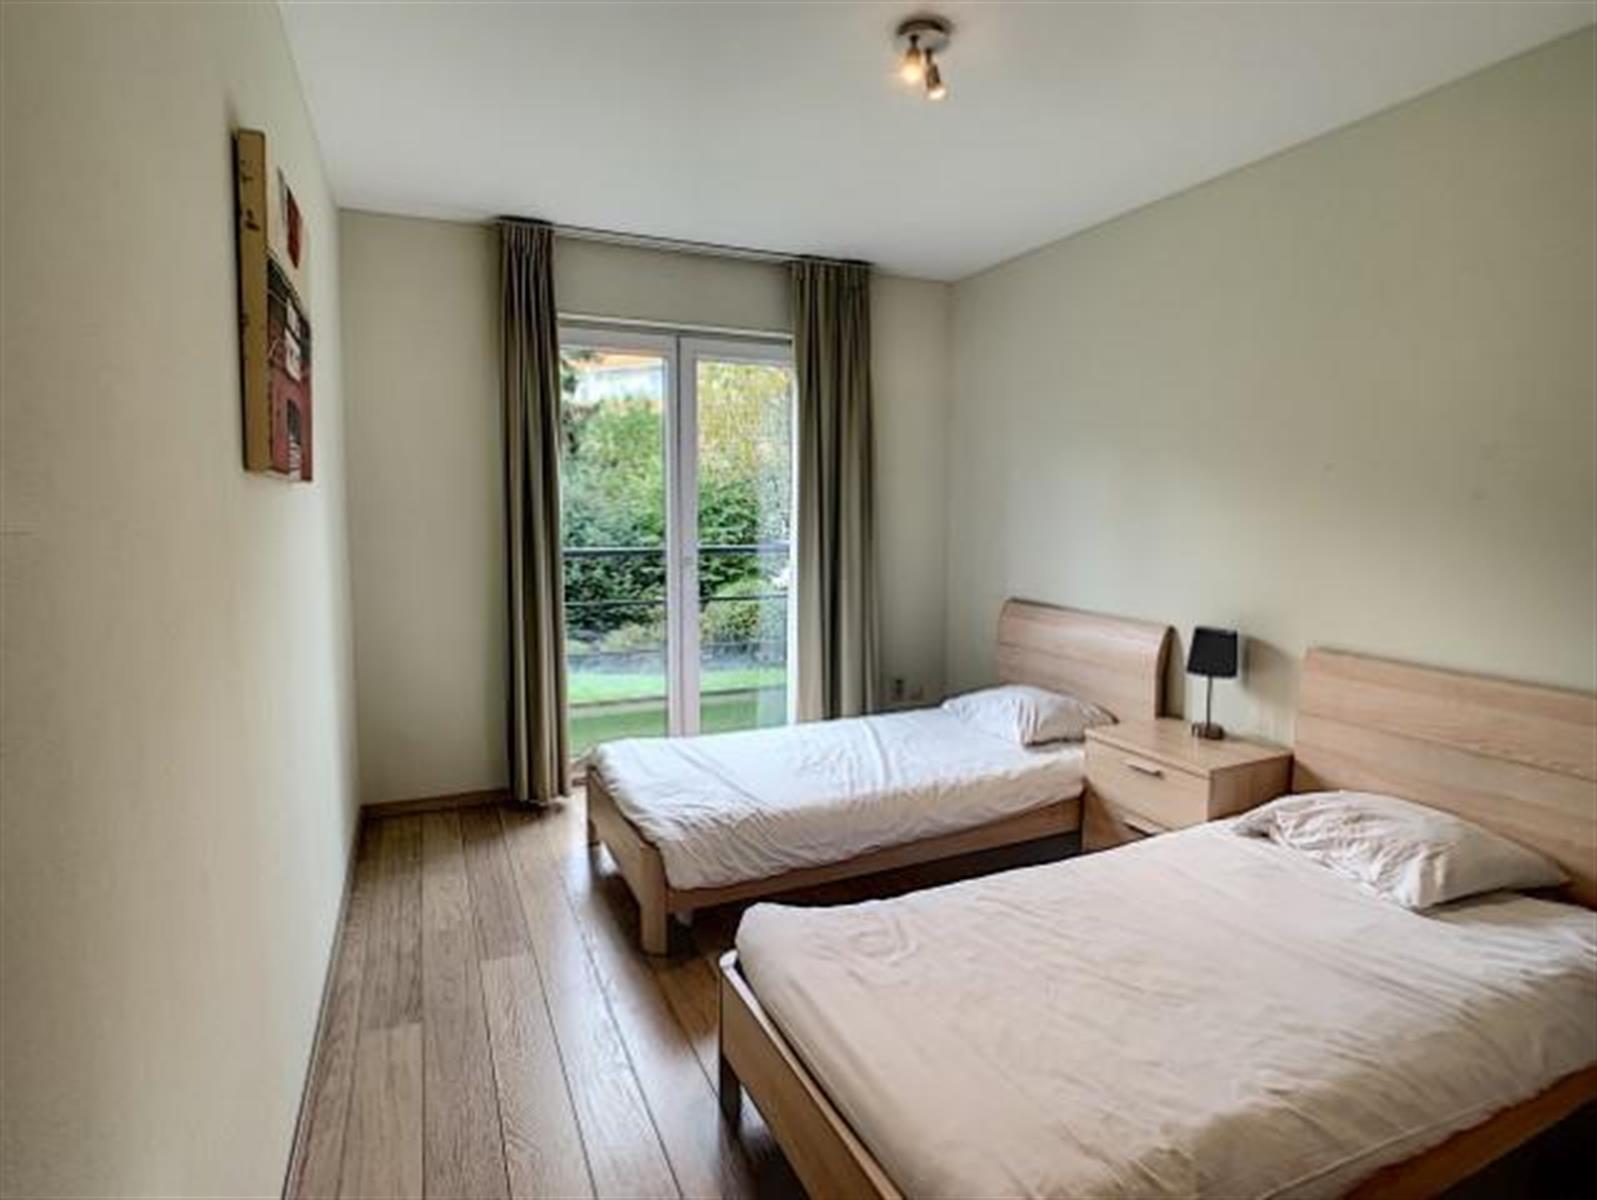 Appartement - Woluwe-Saint-Lambert - #4147227-6